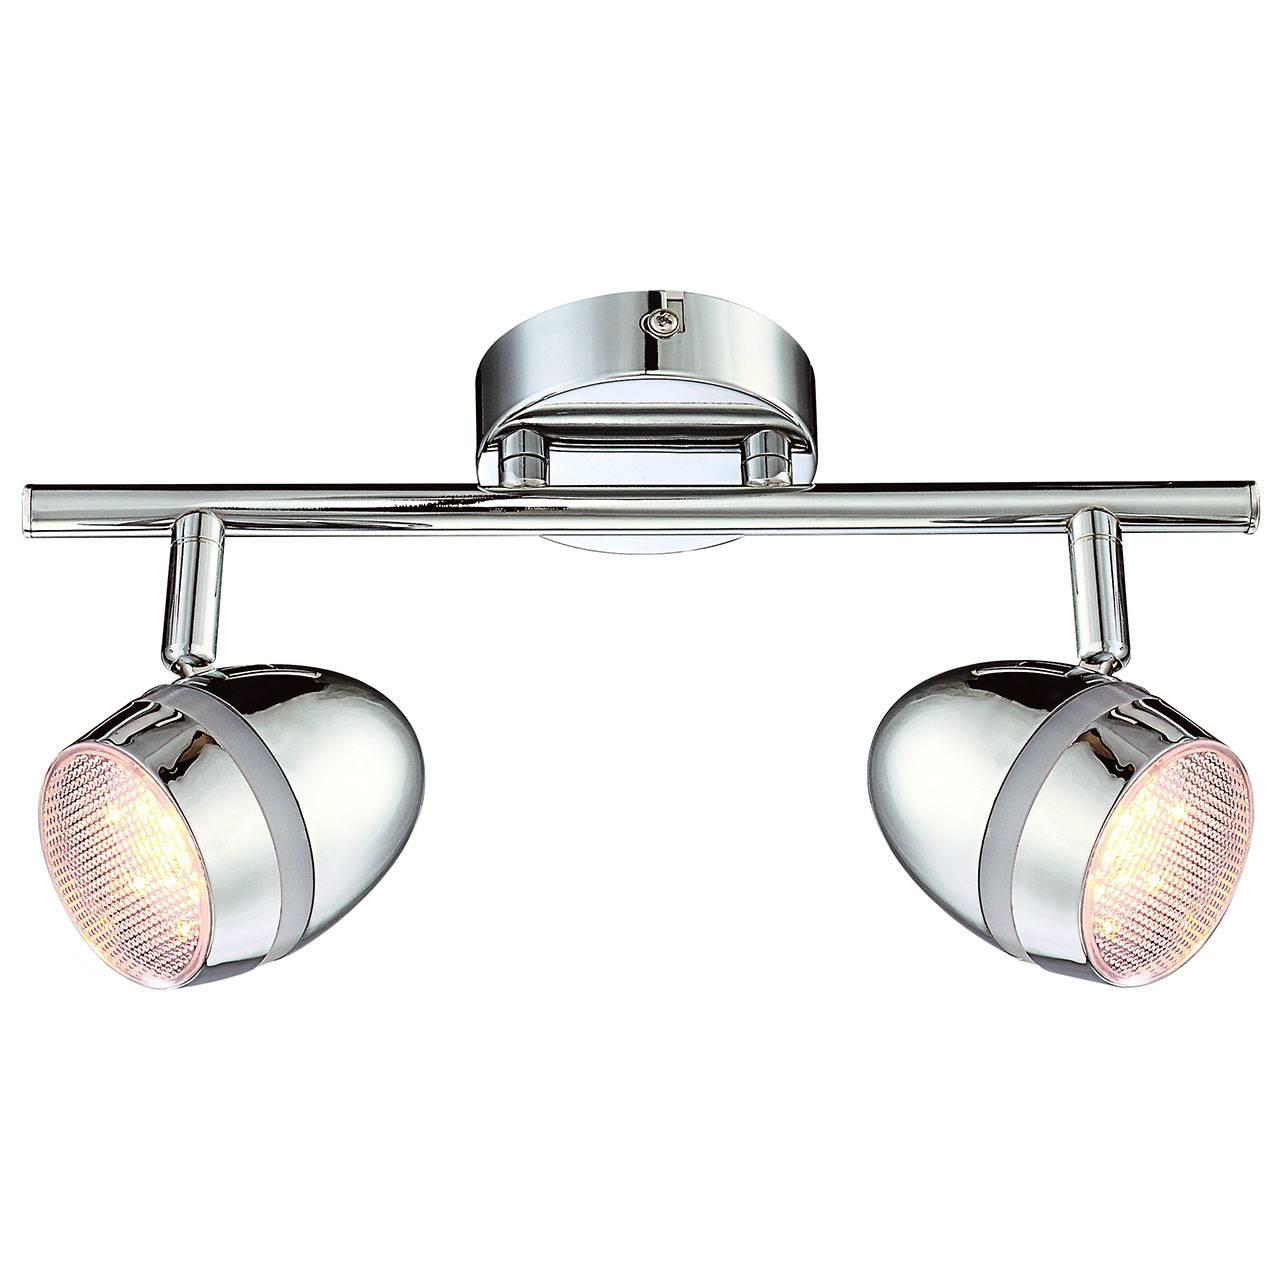 Спот Arte Lamp, LED, 6 Вт спот arte lamp rampa a9412ap 2cc